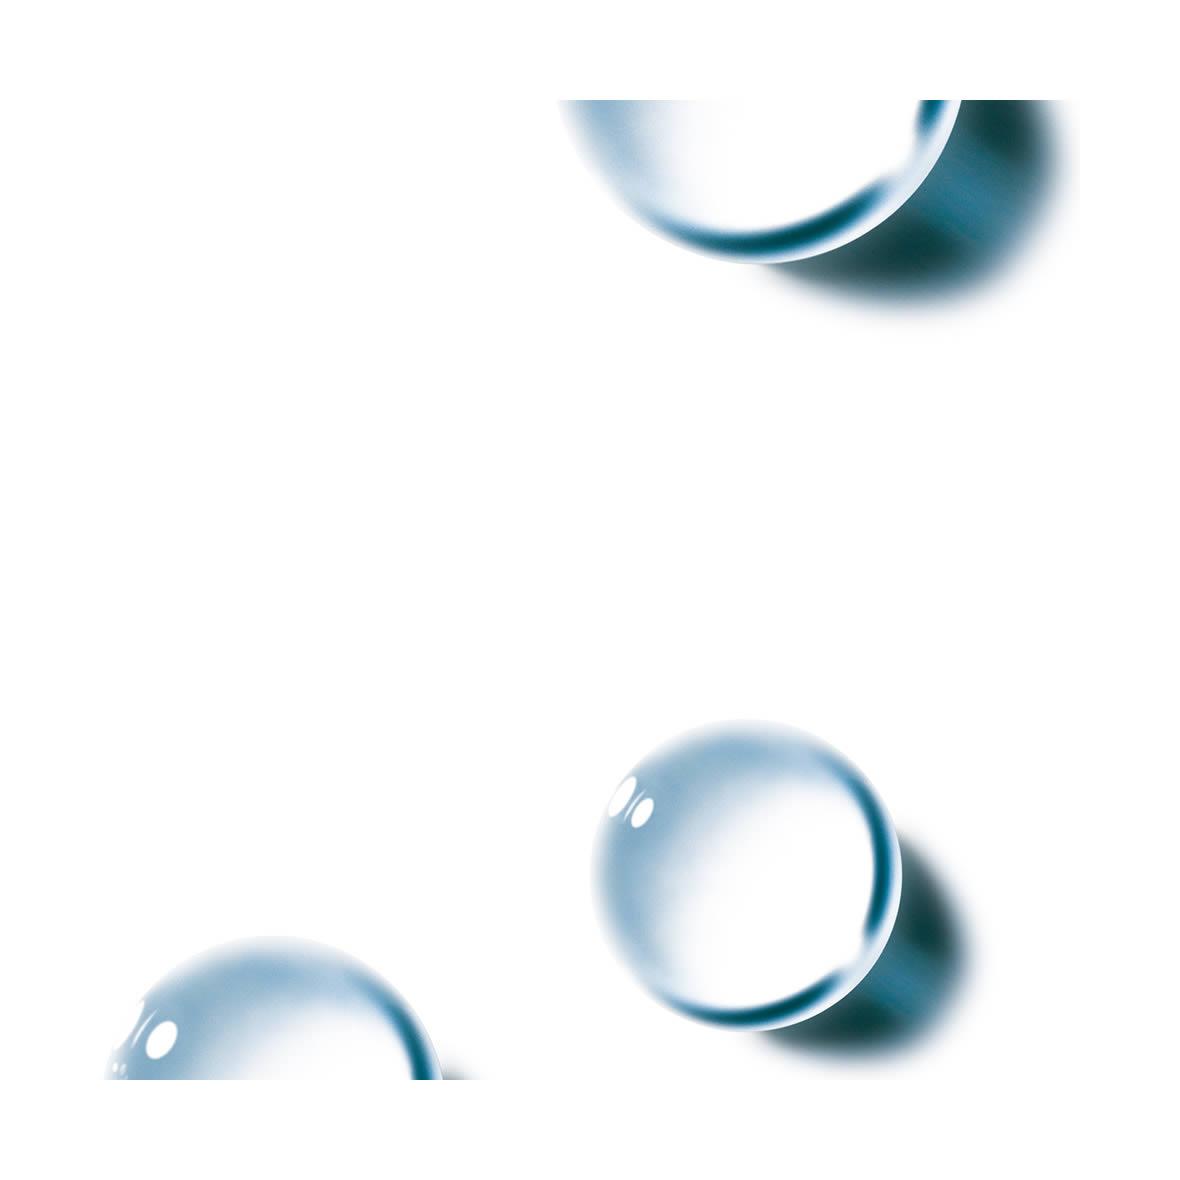 Agua Termal de La Roche-Posay packshot from Agua Termal, by La Roche-Posay